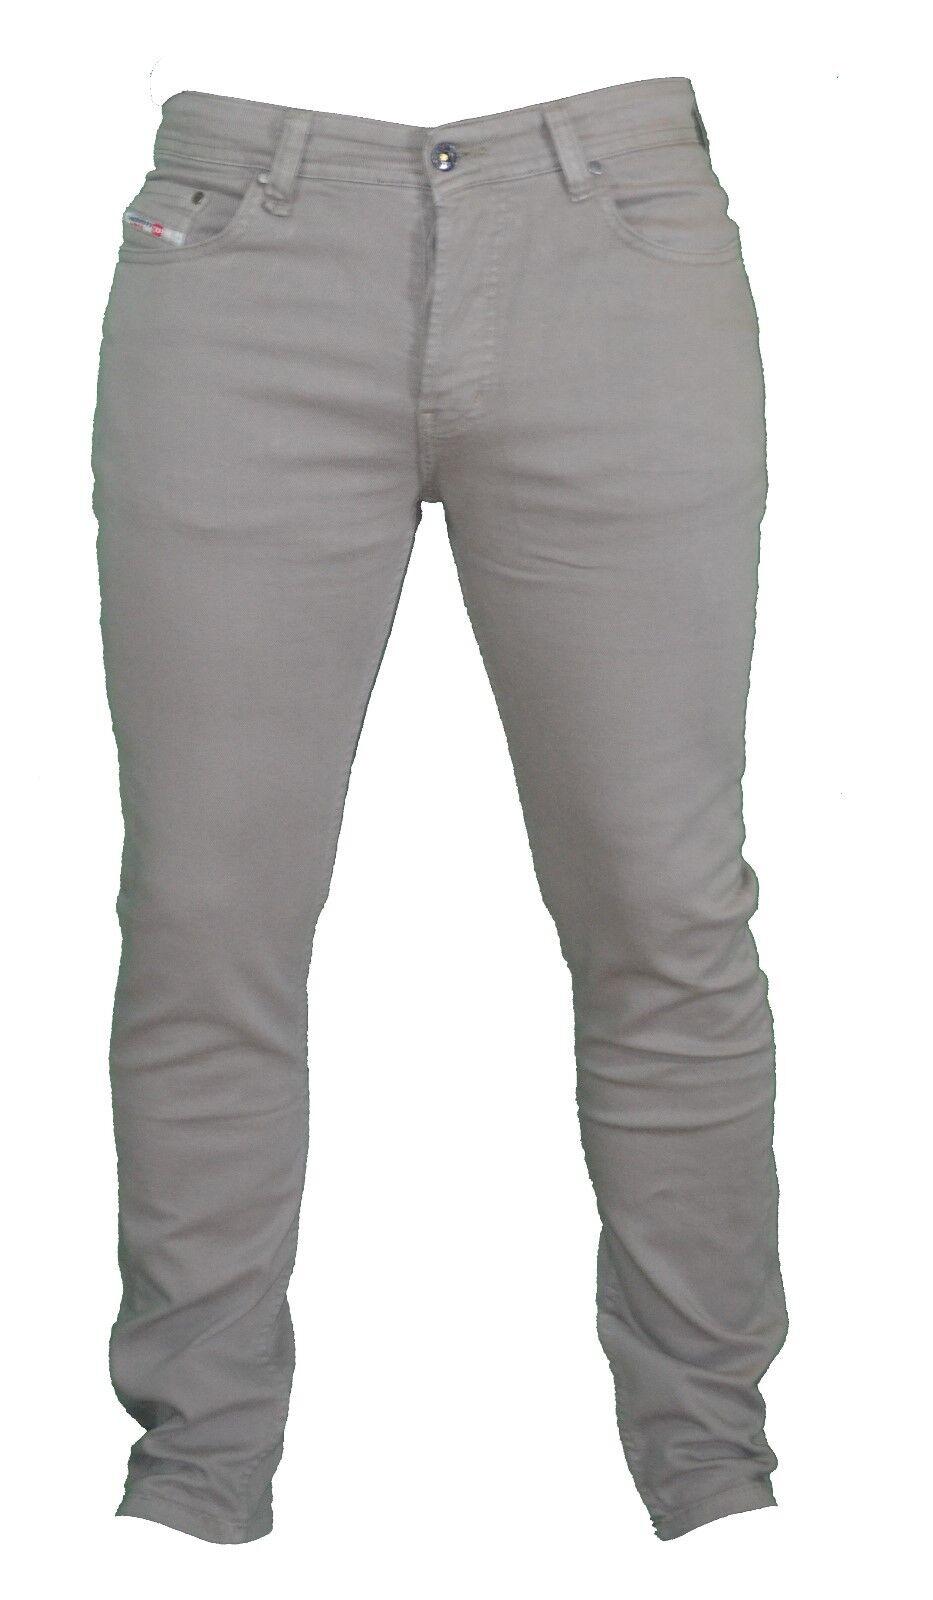 BNWT Diesel per successo LIVING LIVING LIVING colore kaki oliva Casual Pantaloni Jeans Slim Fit 759156